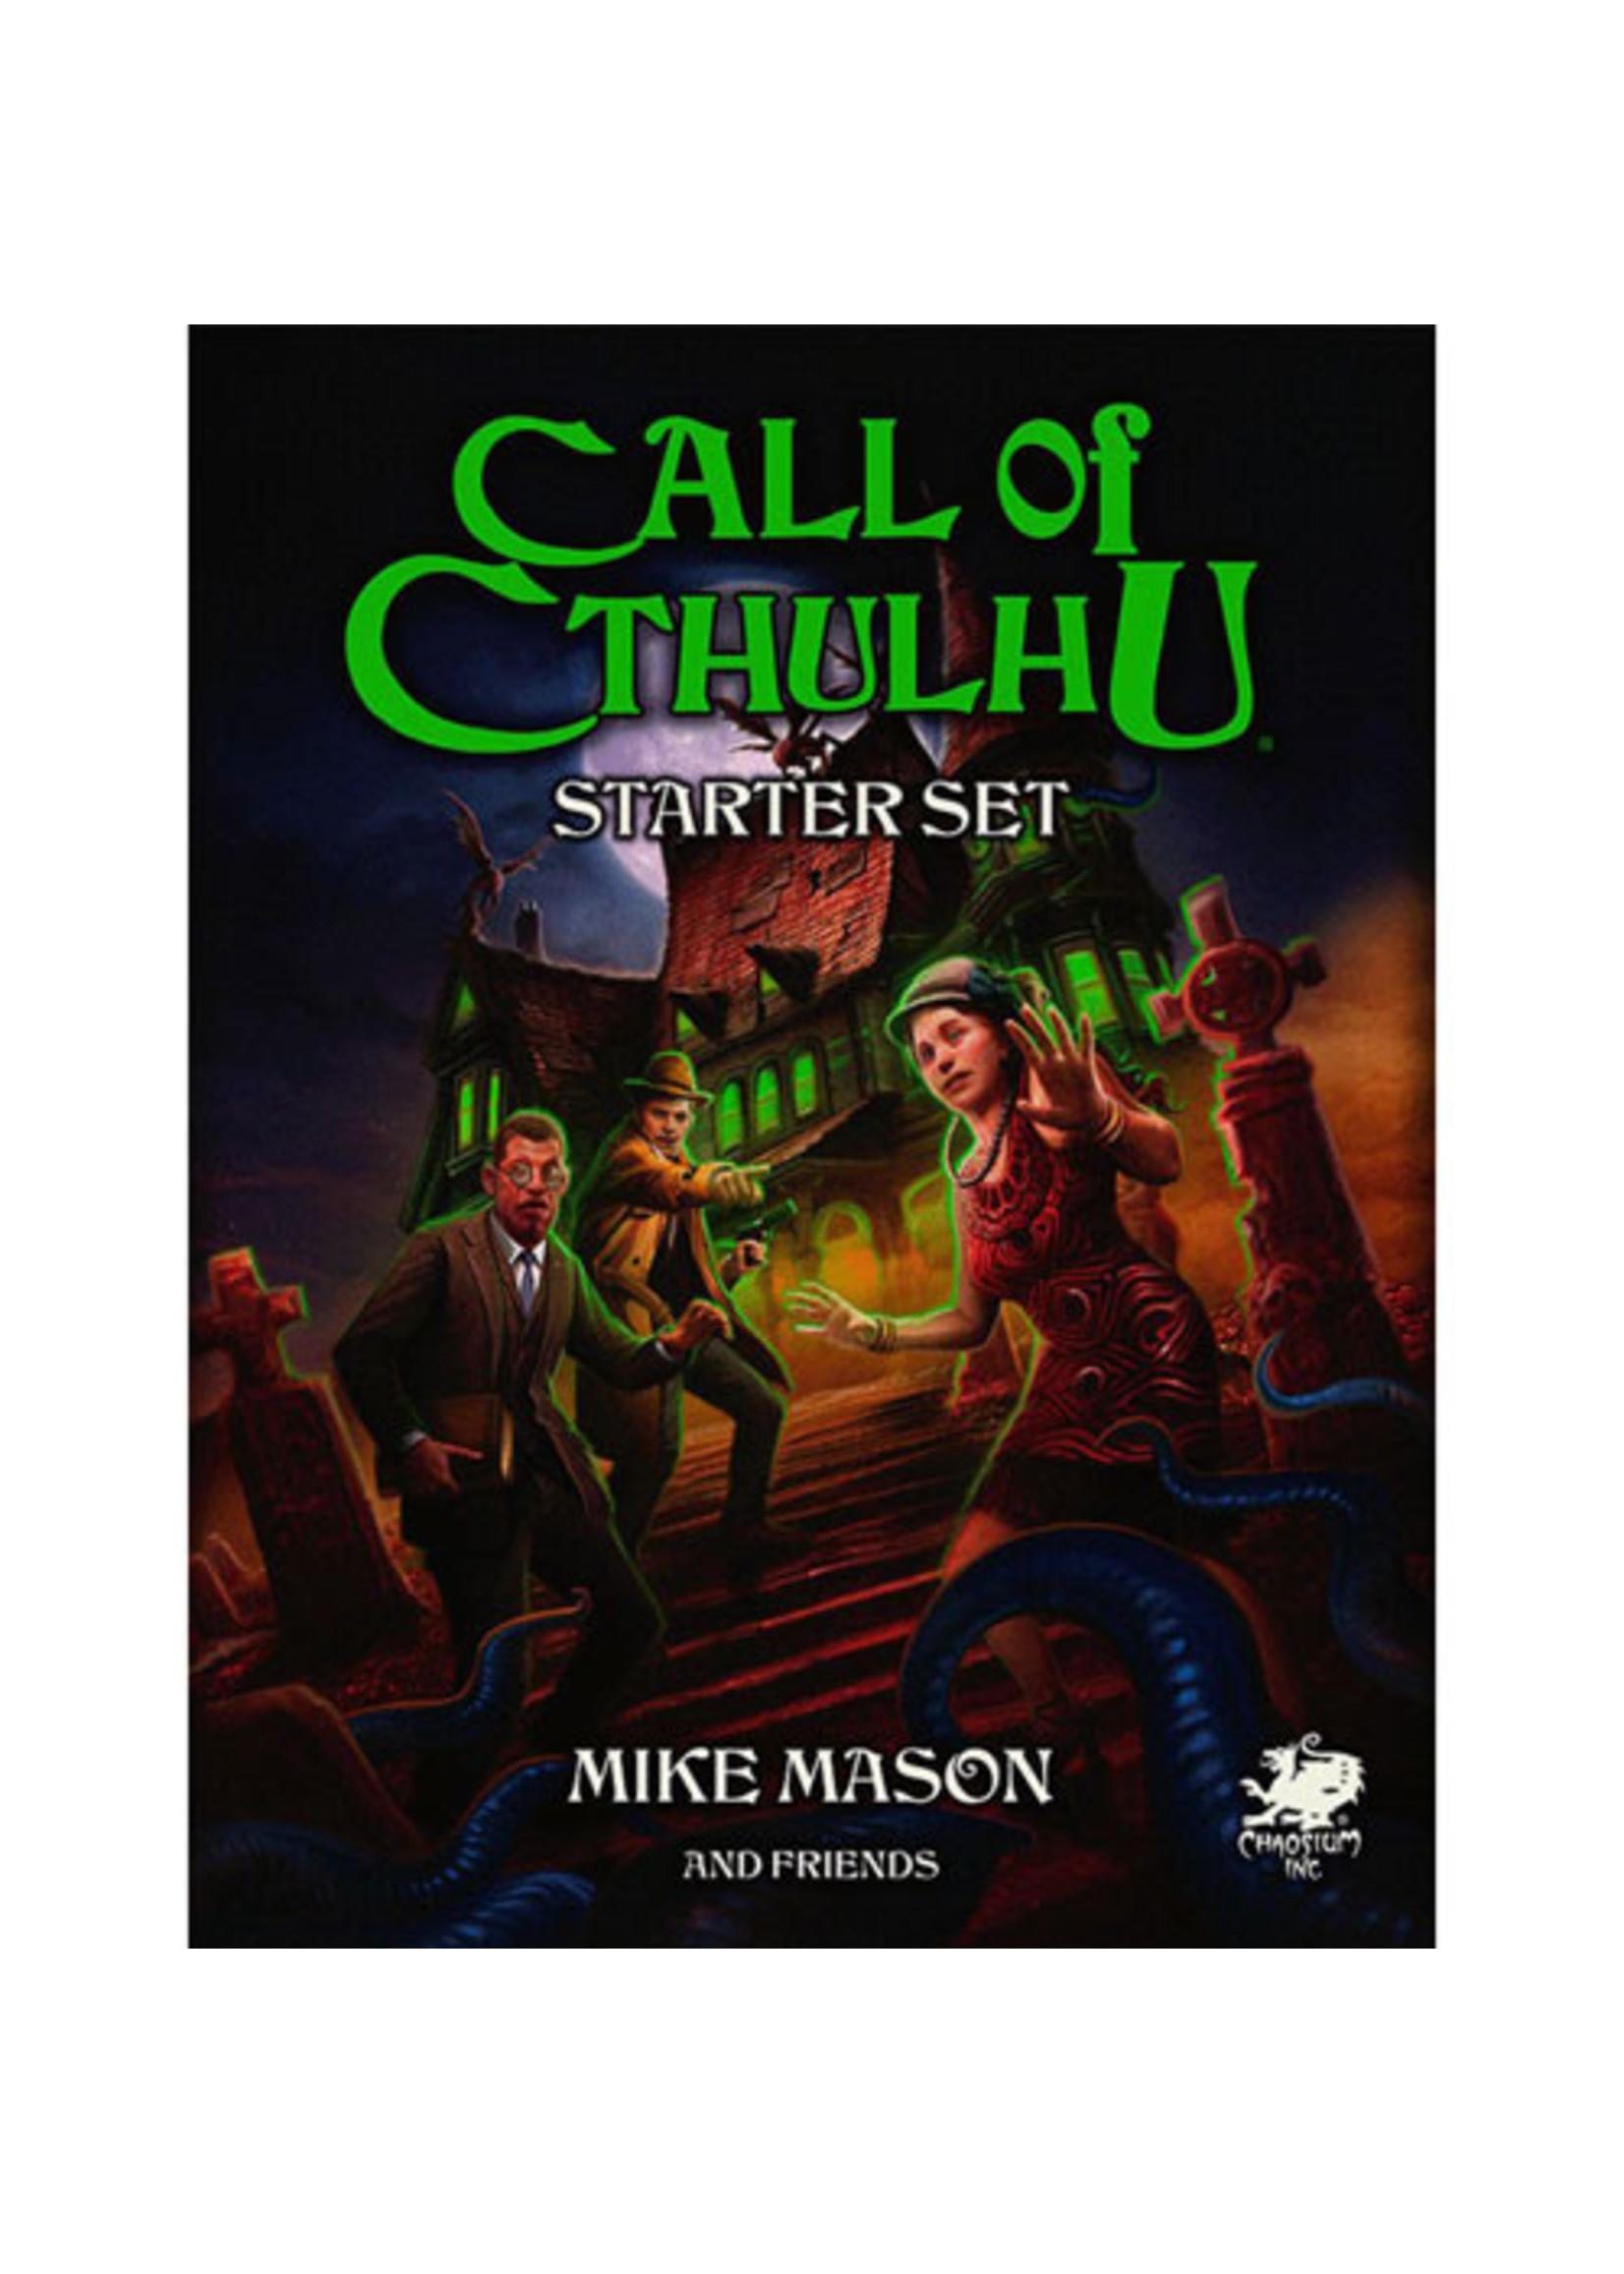 Call of Cthulhu: Starter Set